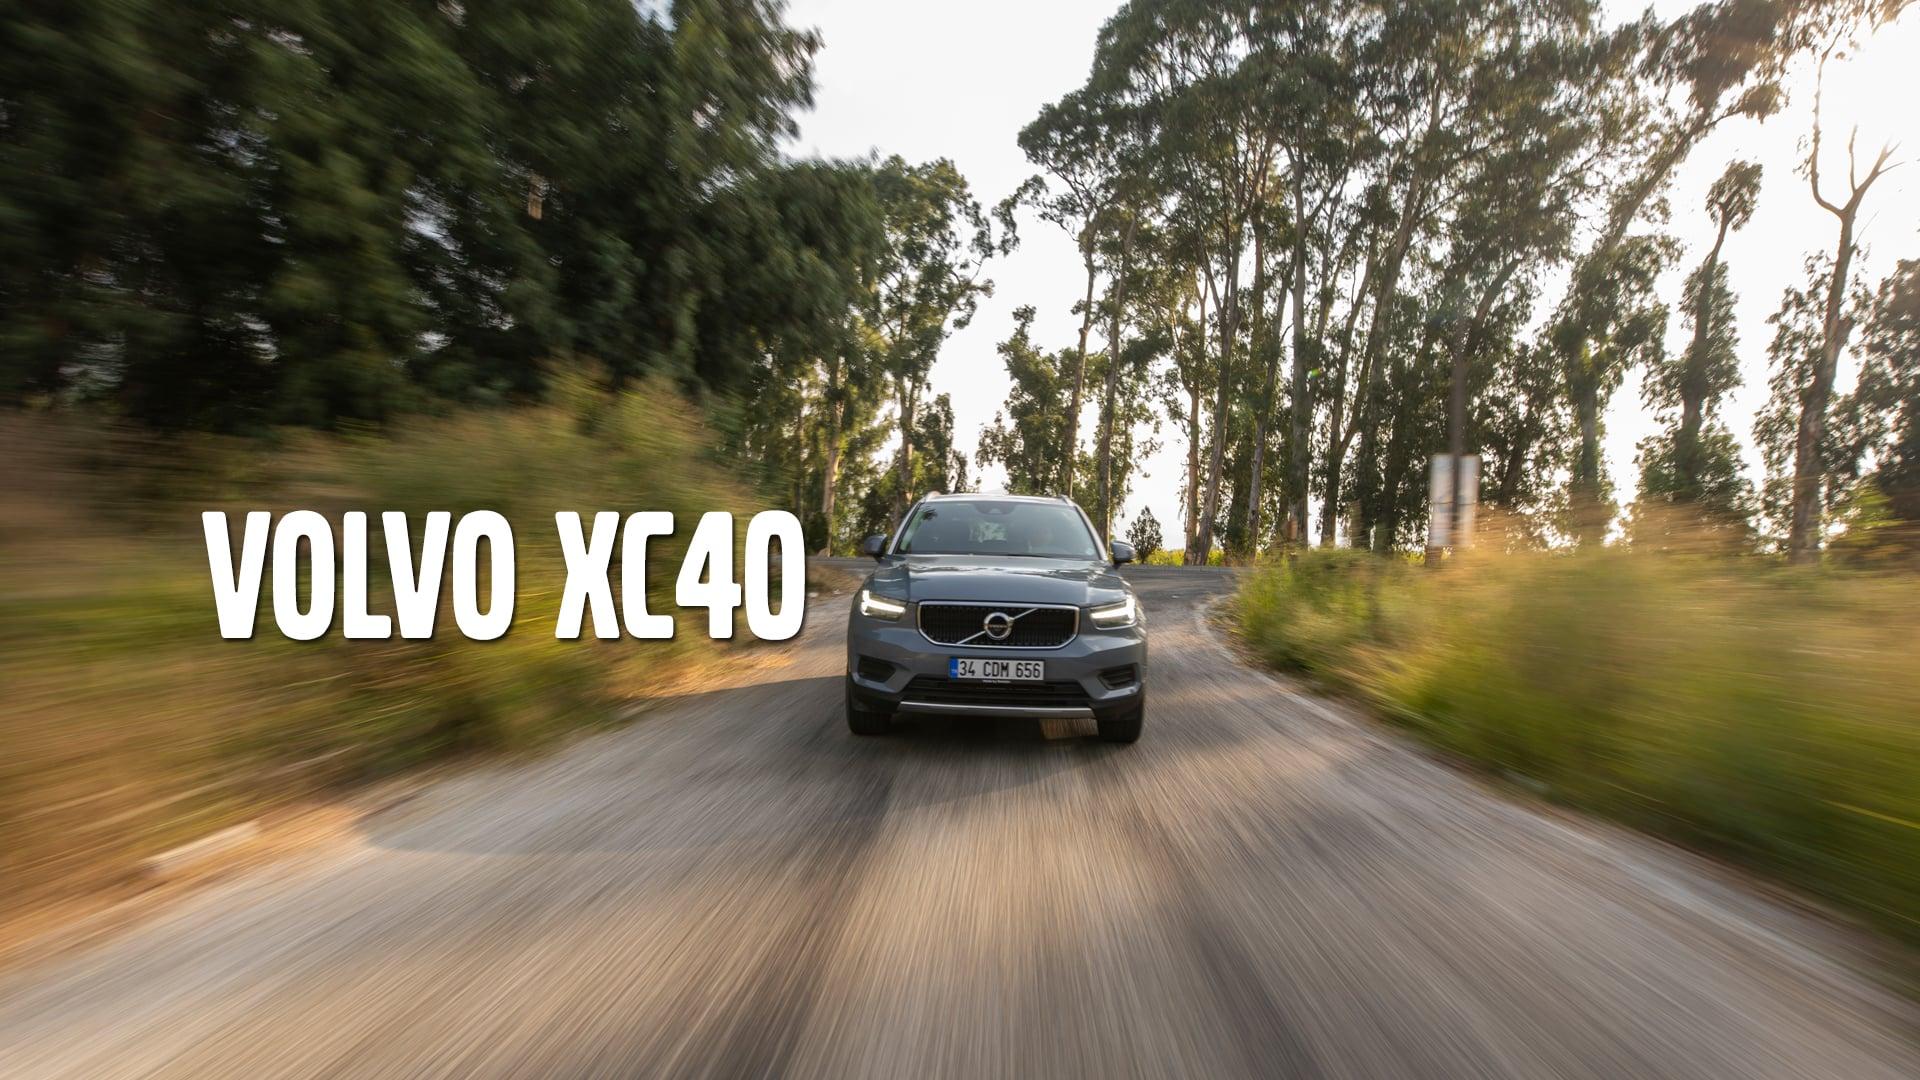 Volvo XC40 Kite Surfer